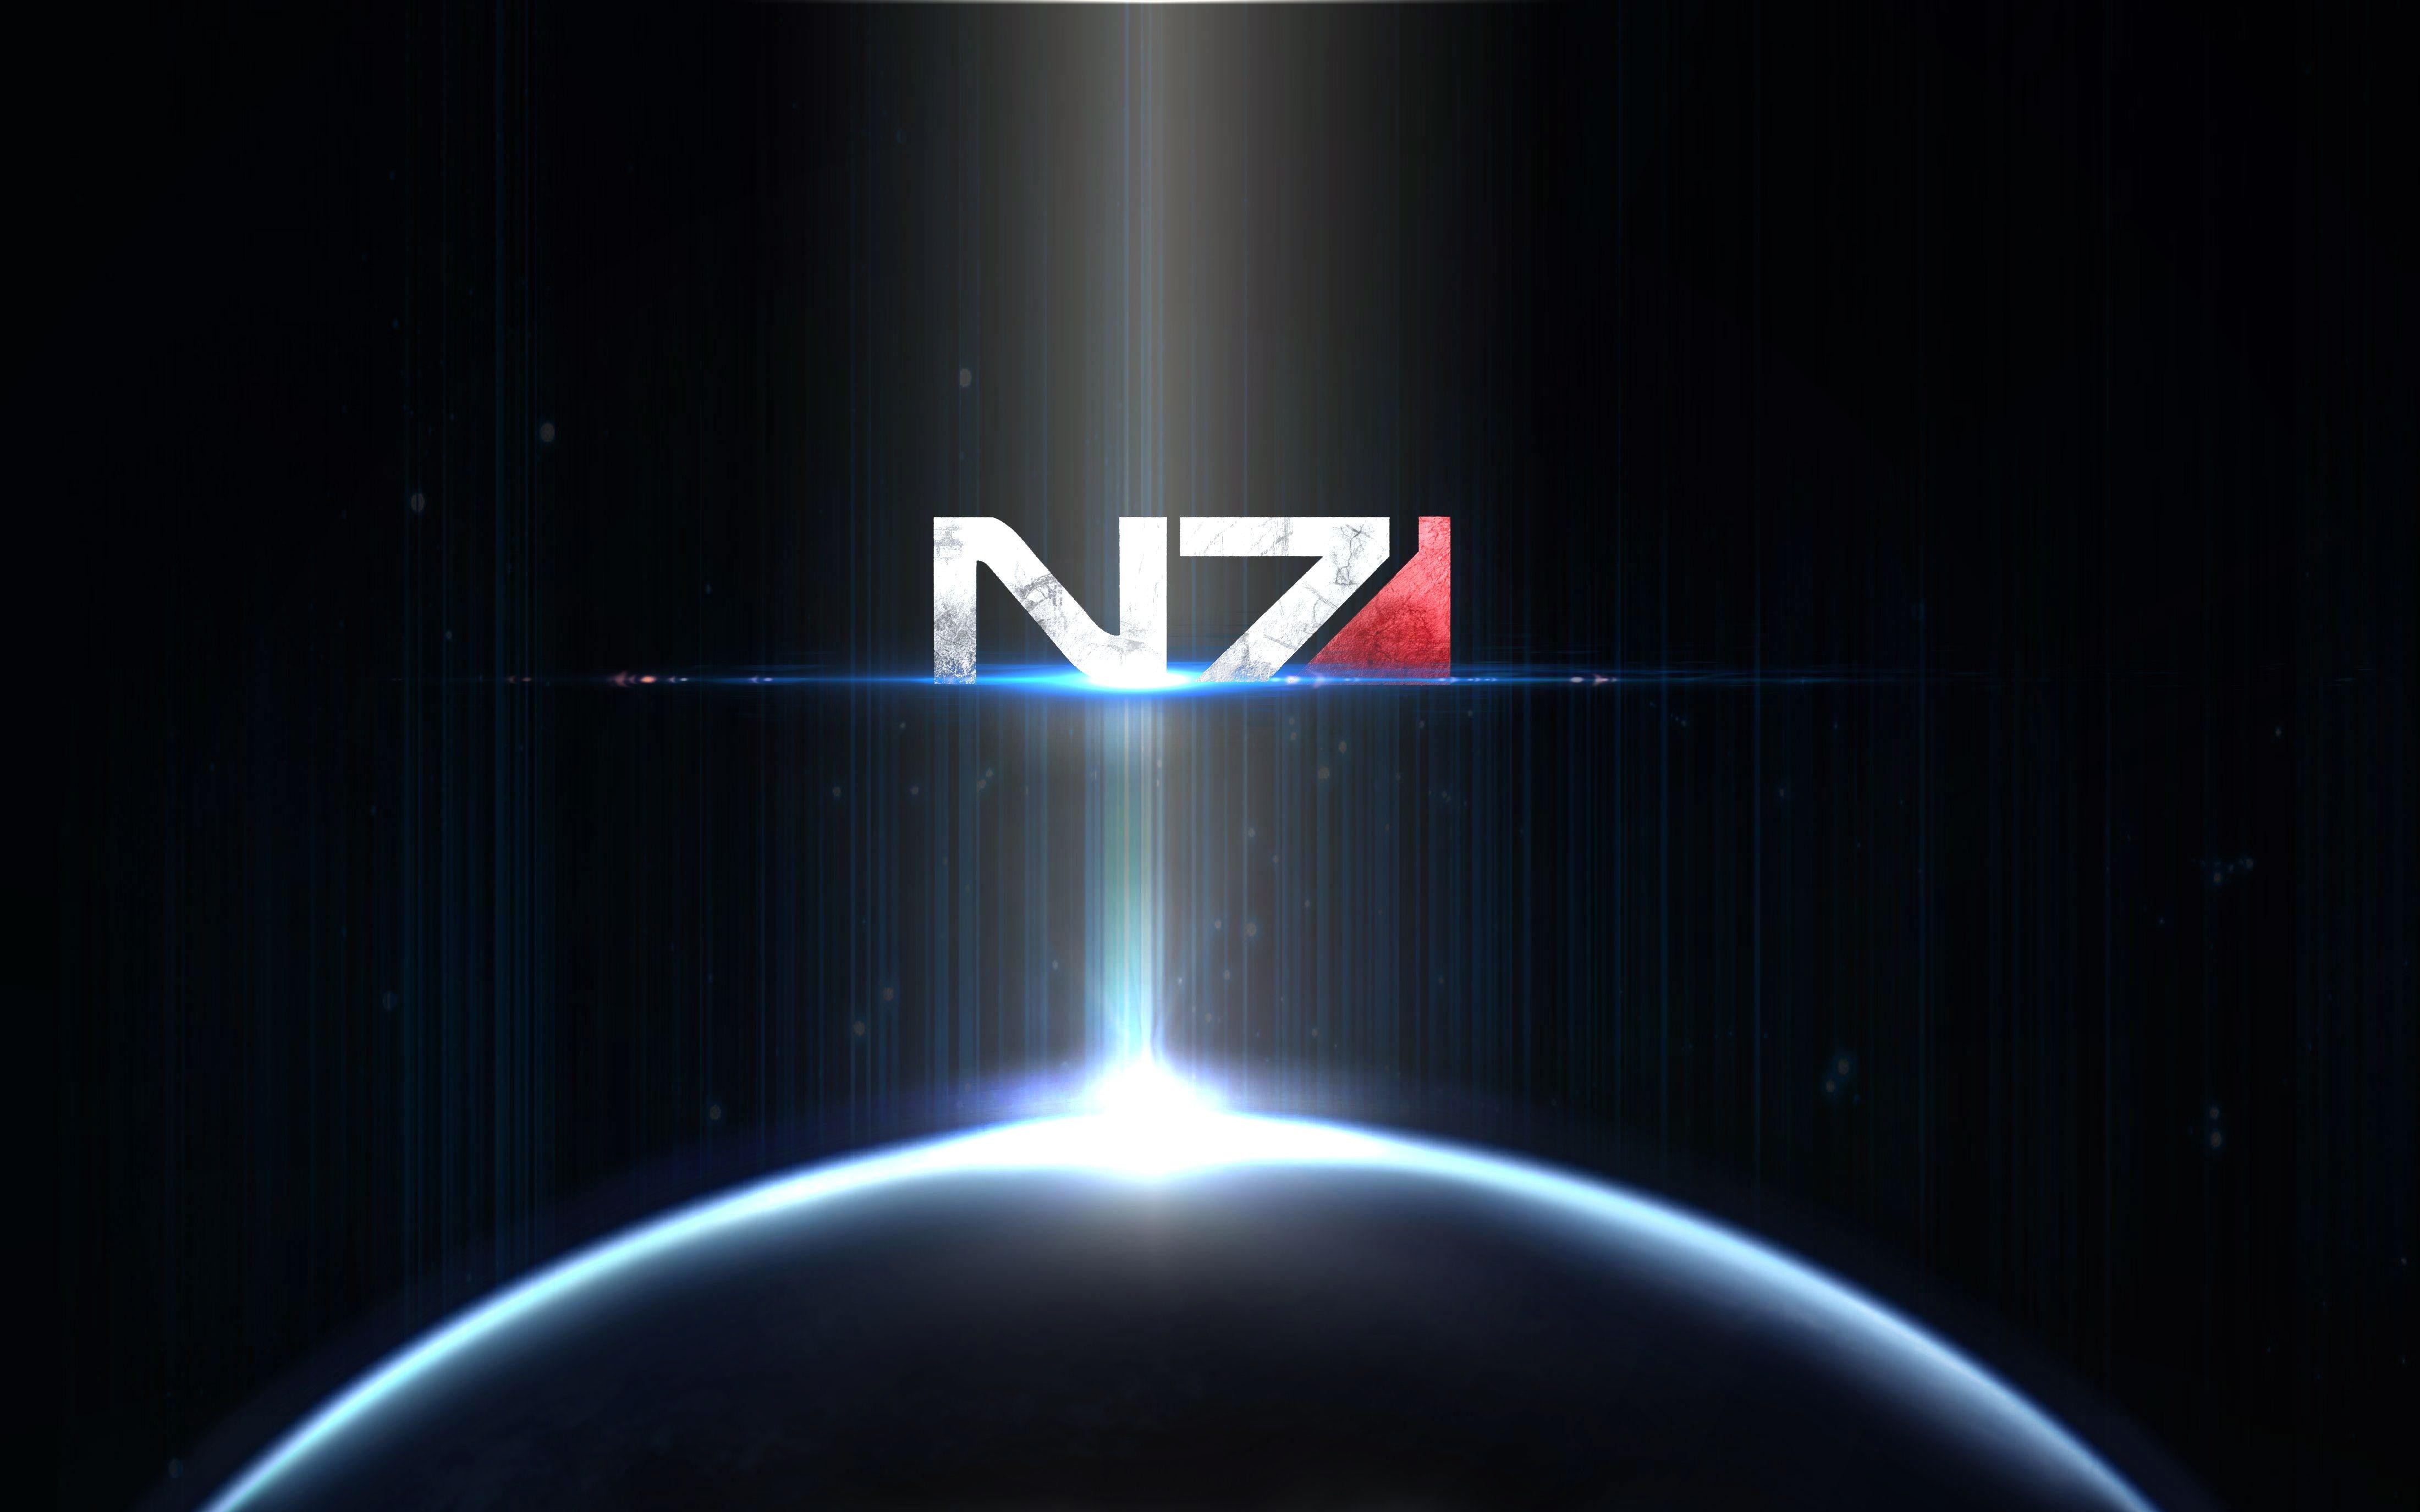 N7 Phone Wallpaper